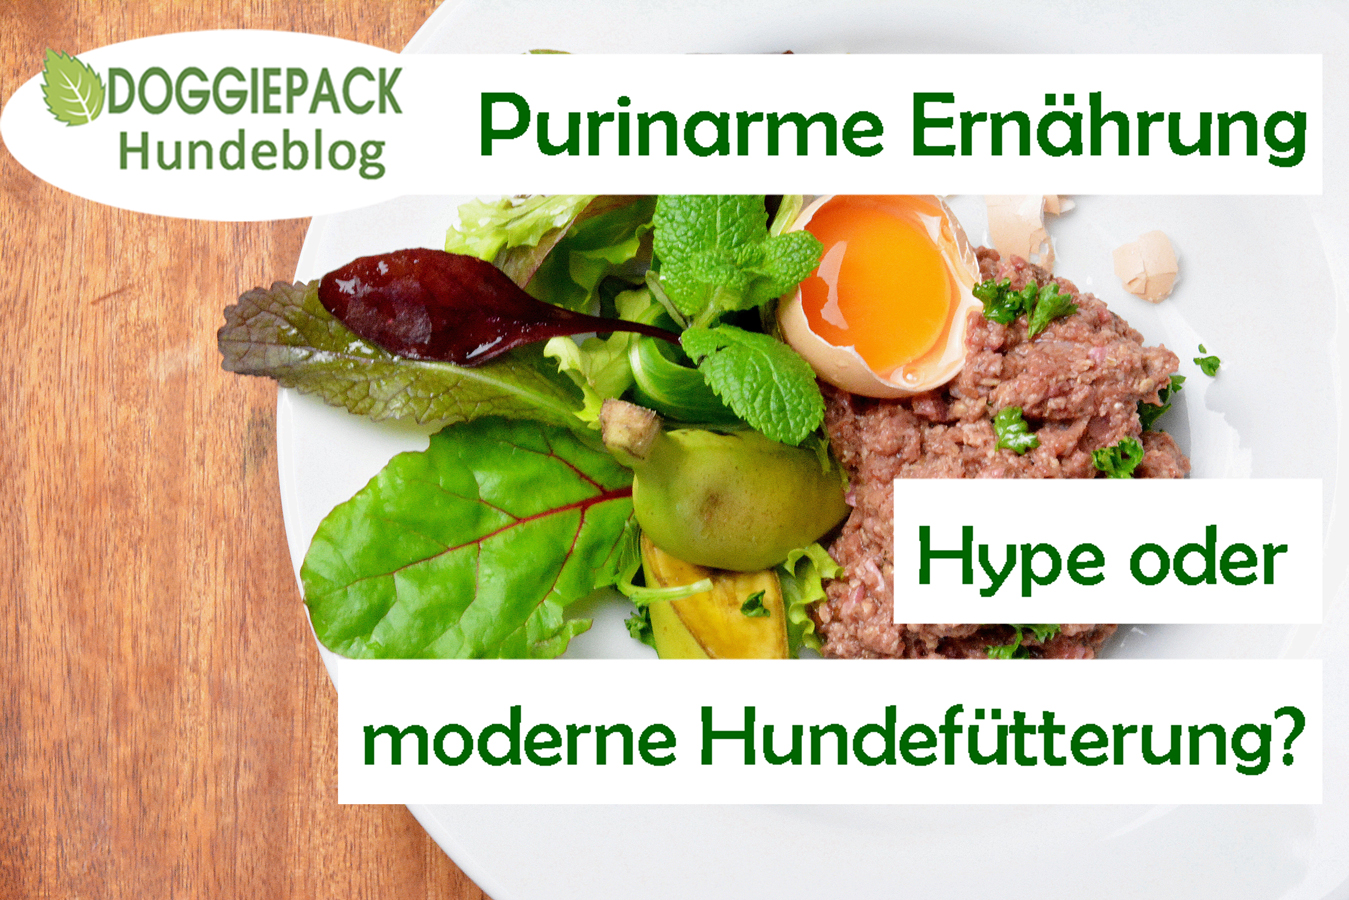 blog_purinarme_ernaehrung_hype_modern_doggiepack